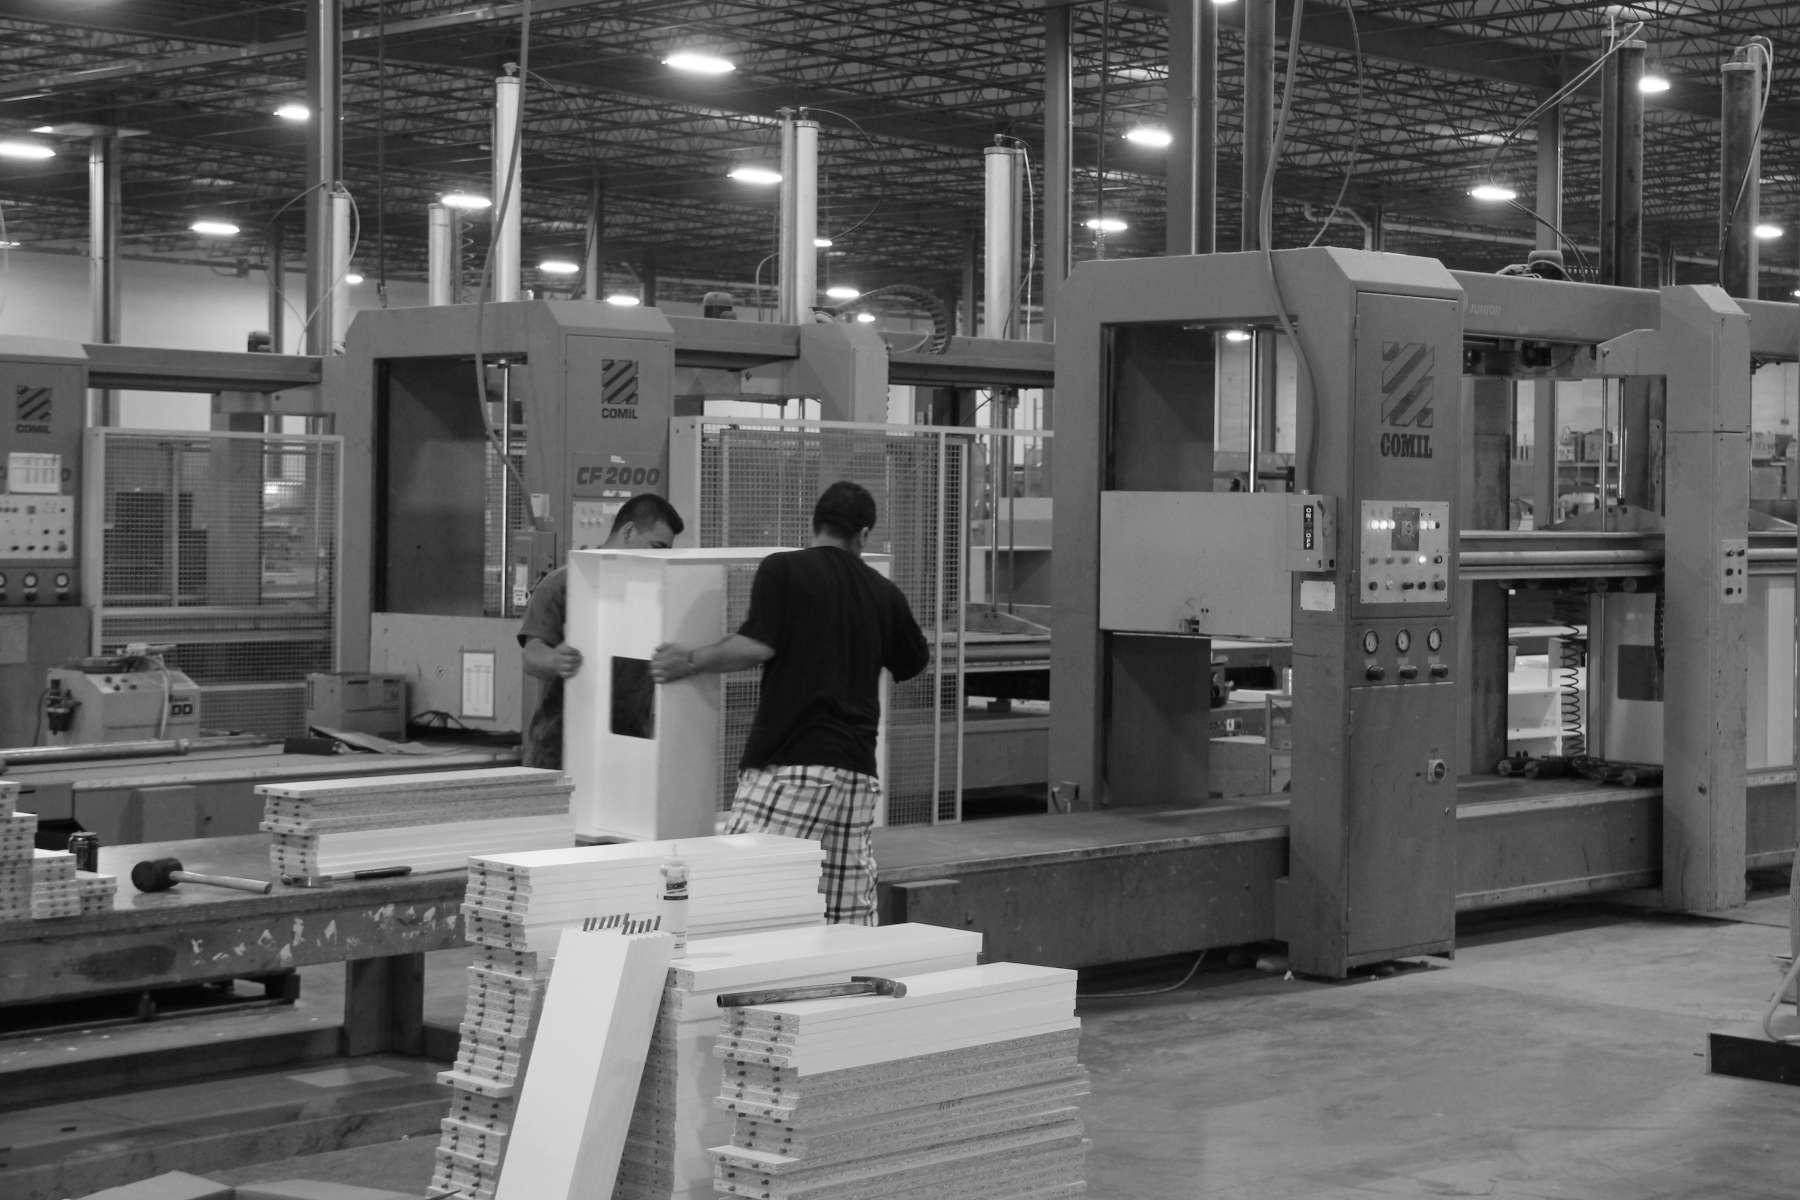 https://mw-sf.com/wp-content/uploads/2019/11/wood-manufacturing-03.jpg